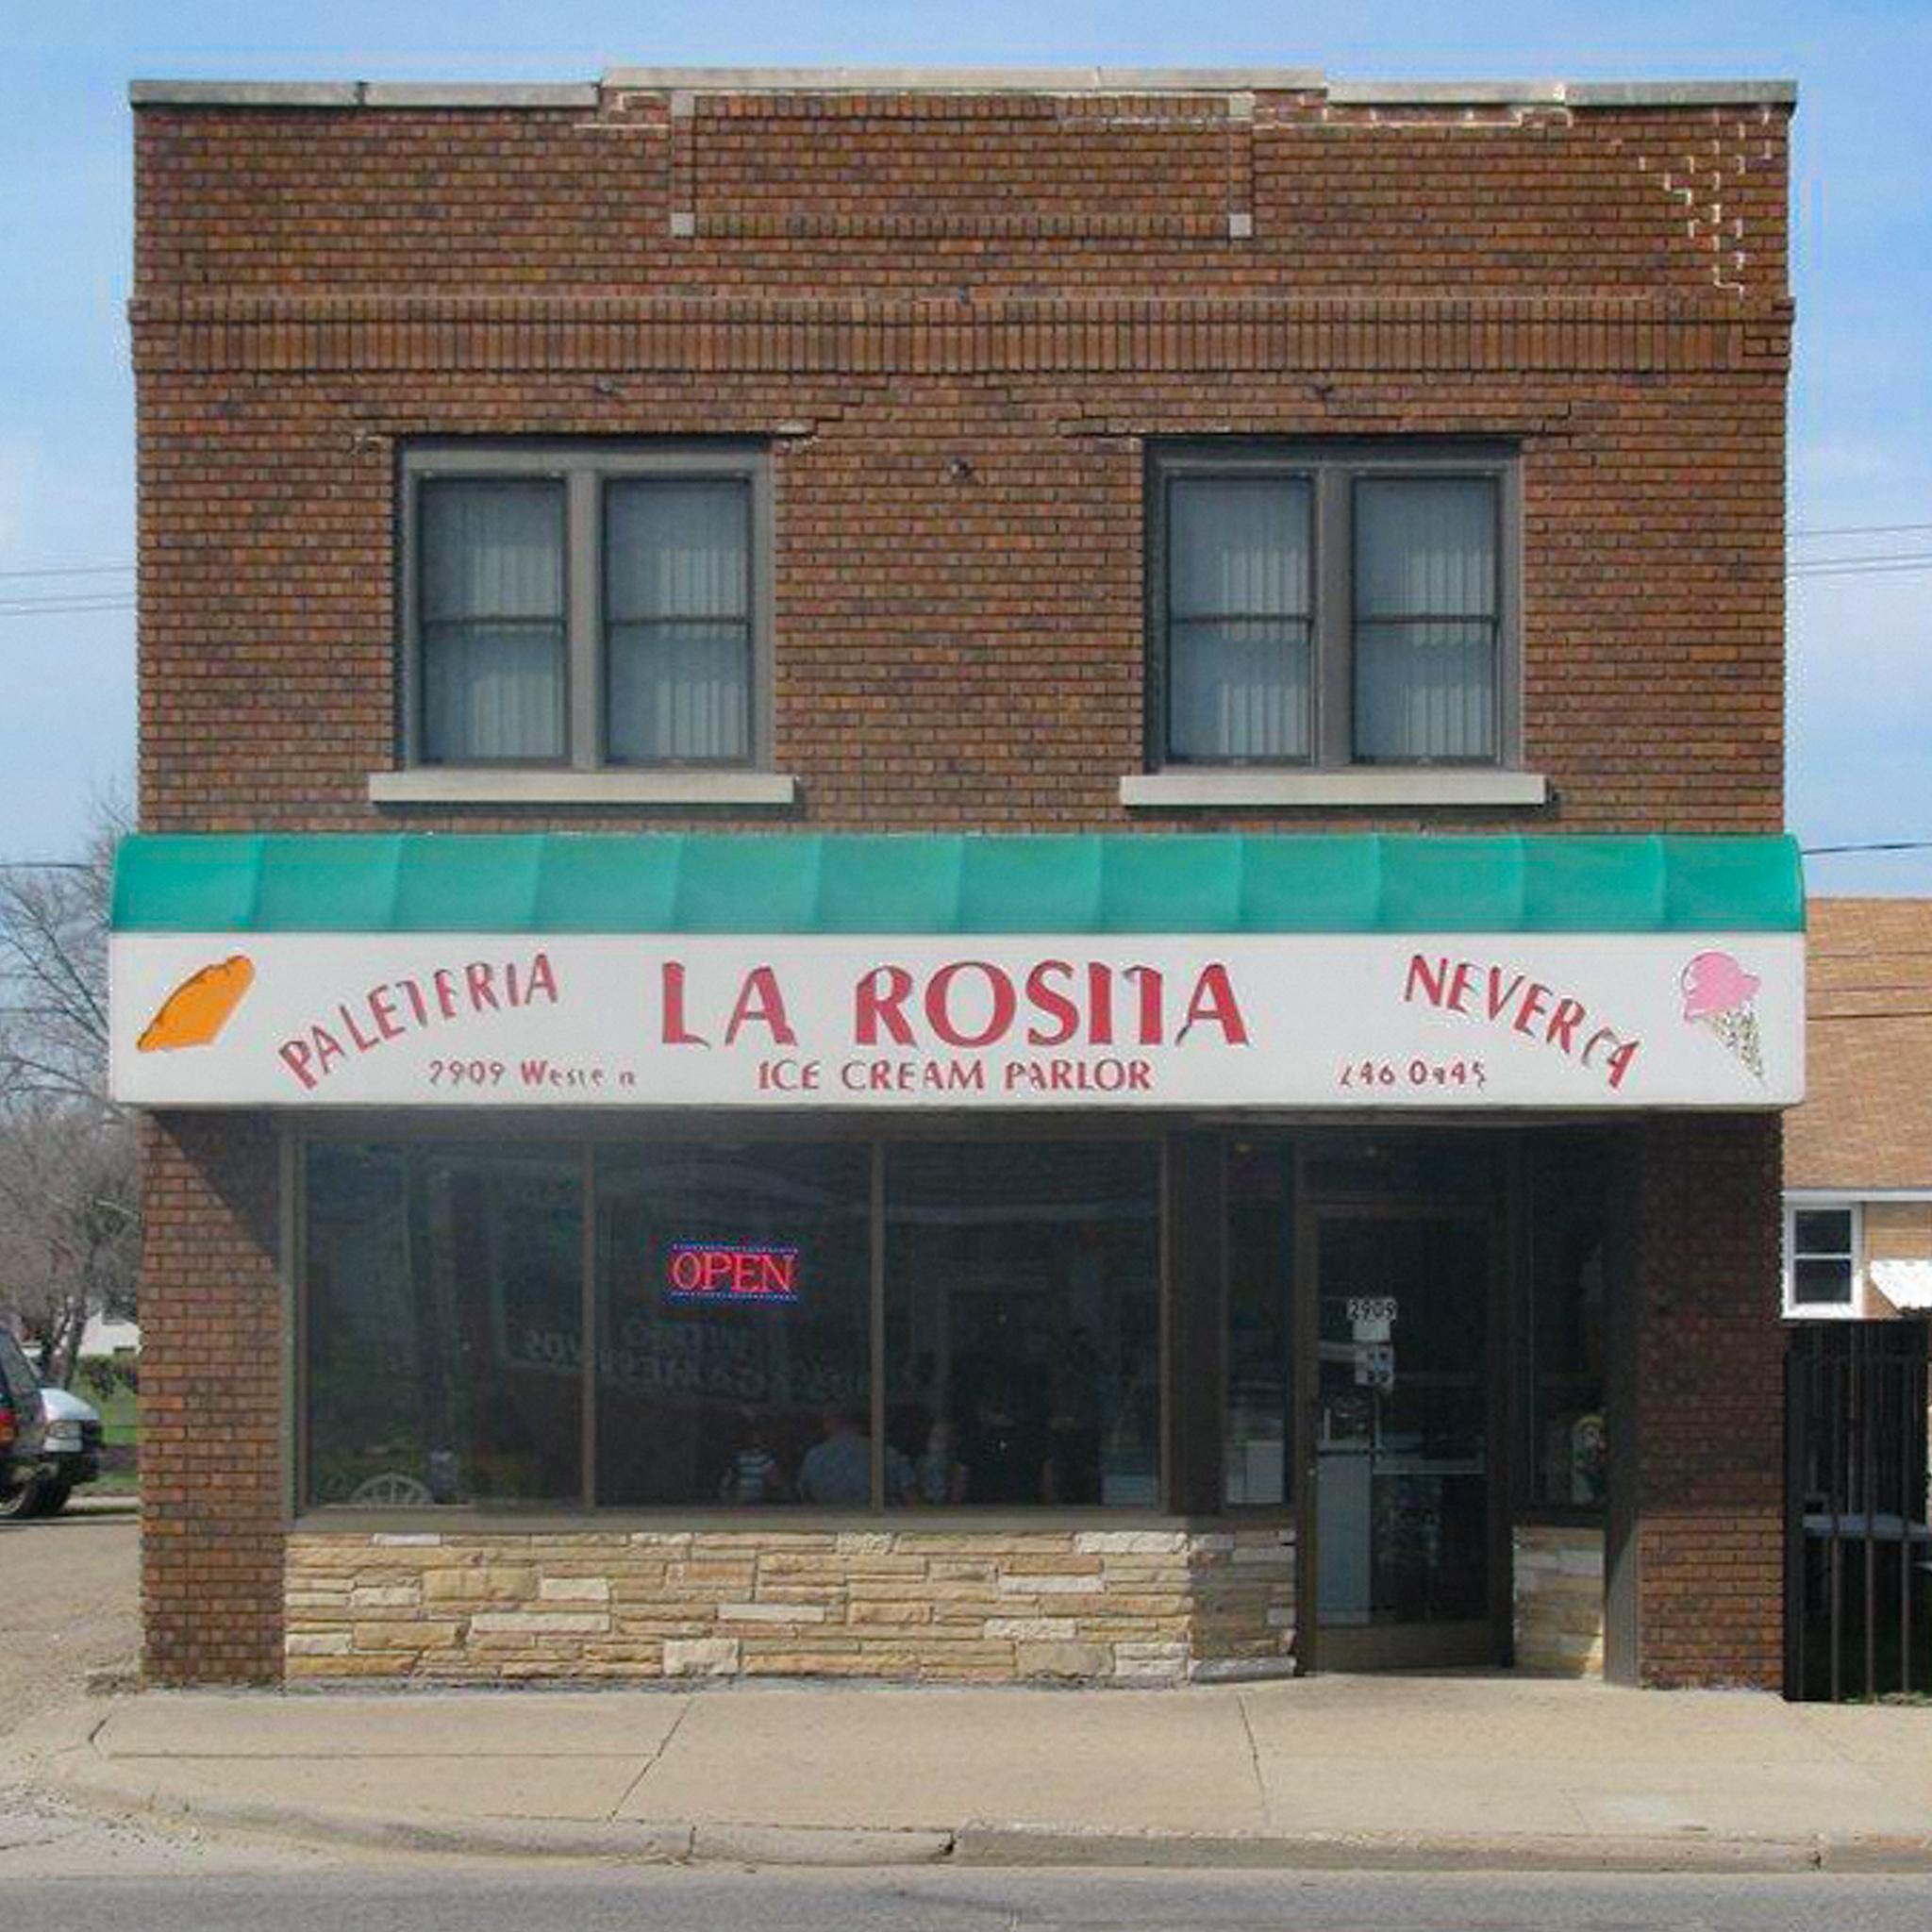 La Rosita prior to their city-assisted facade transformation.